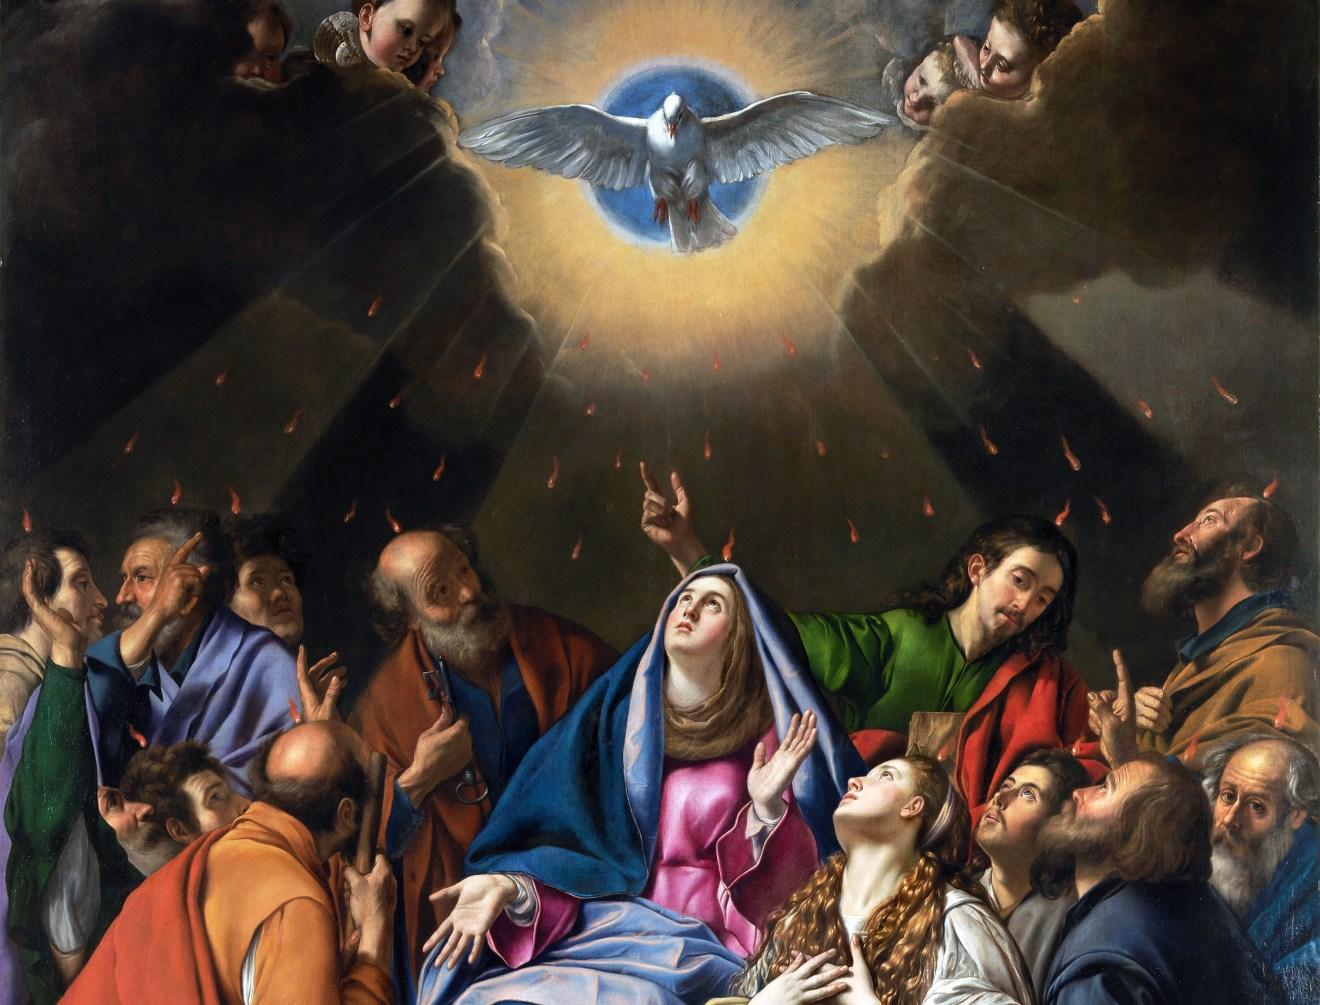 A Pentecost Message from Bishop Kucharek